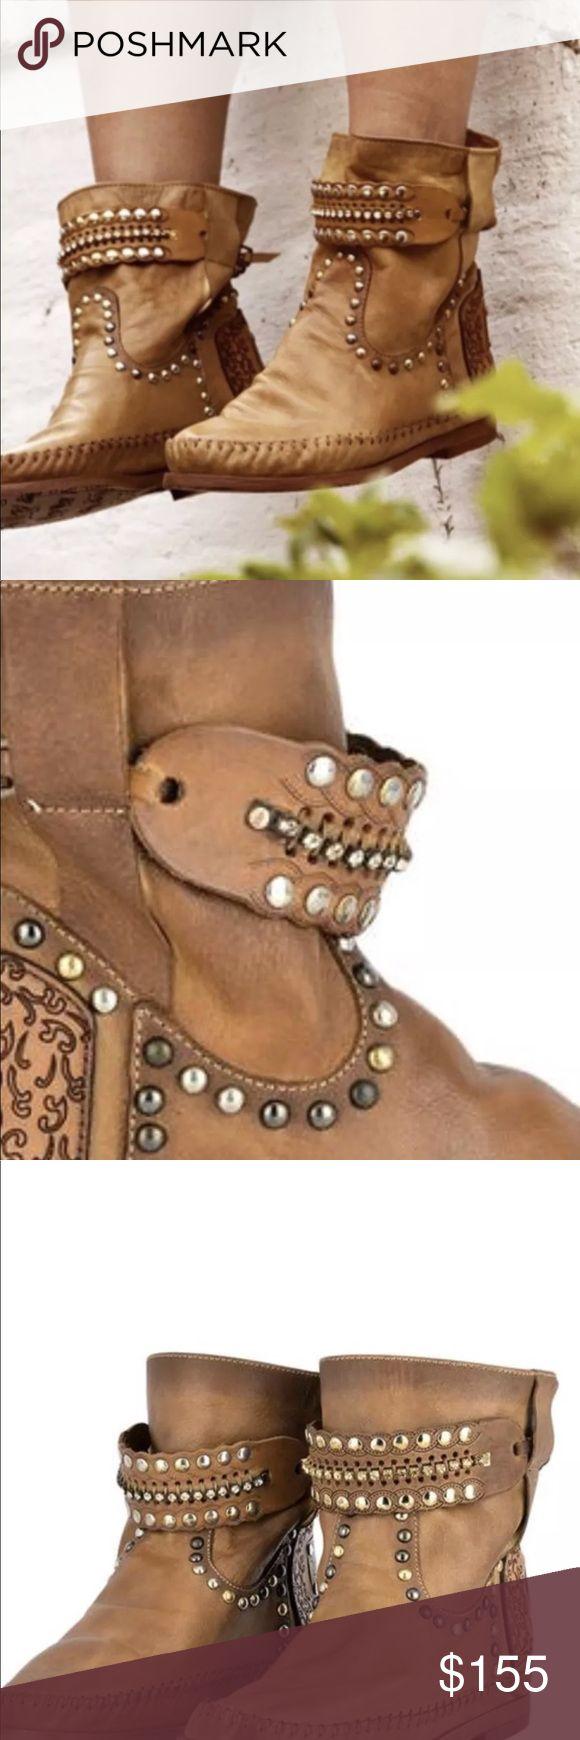 I just added this listing on Poshmark: Karma of charma soft leather moccasin boots.. #shopmycloset #poshmark #fashion #shopping #style #forsale #karma of charme #Shoes